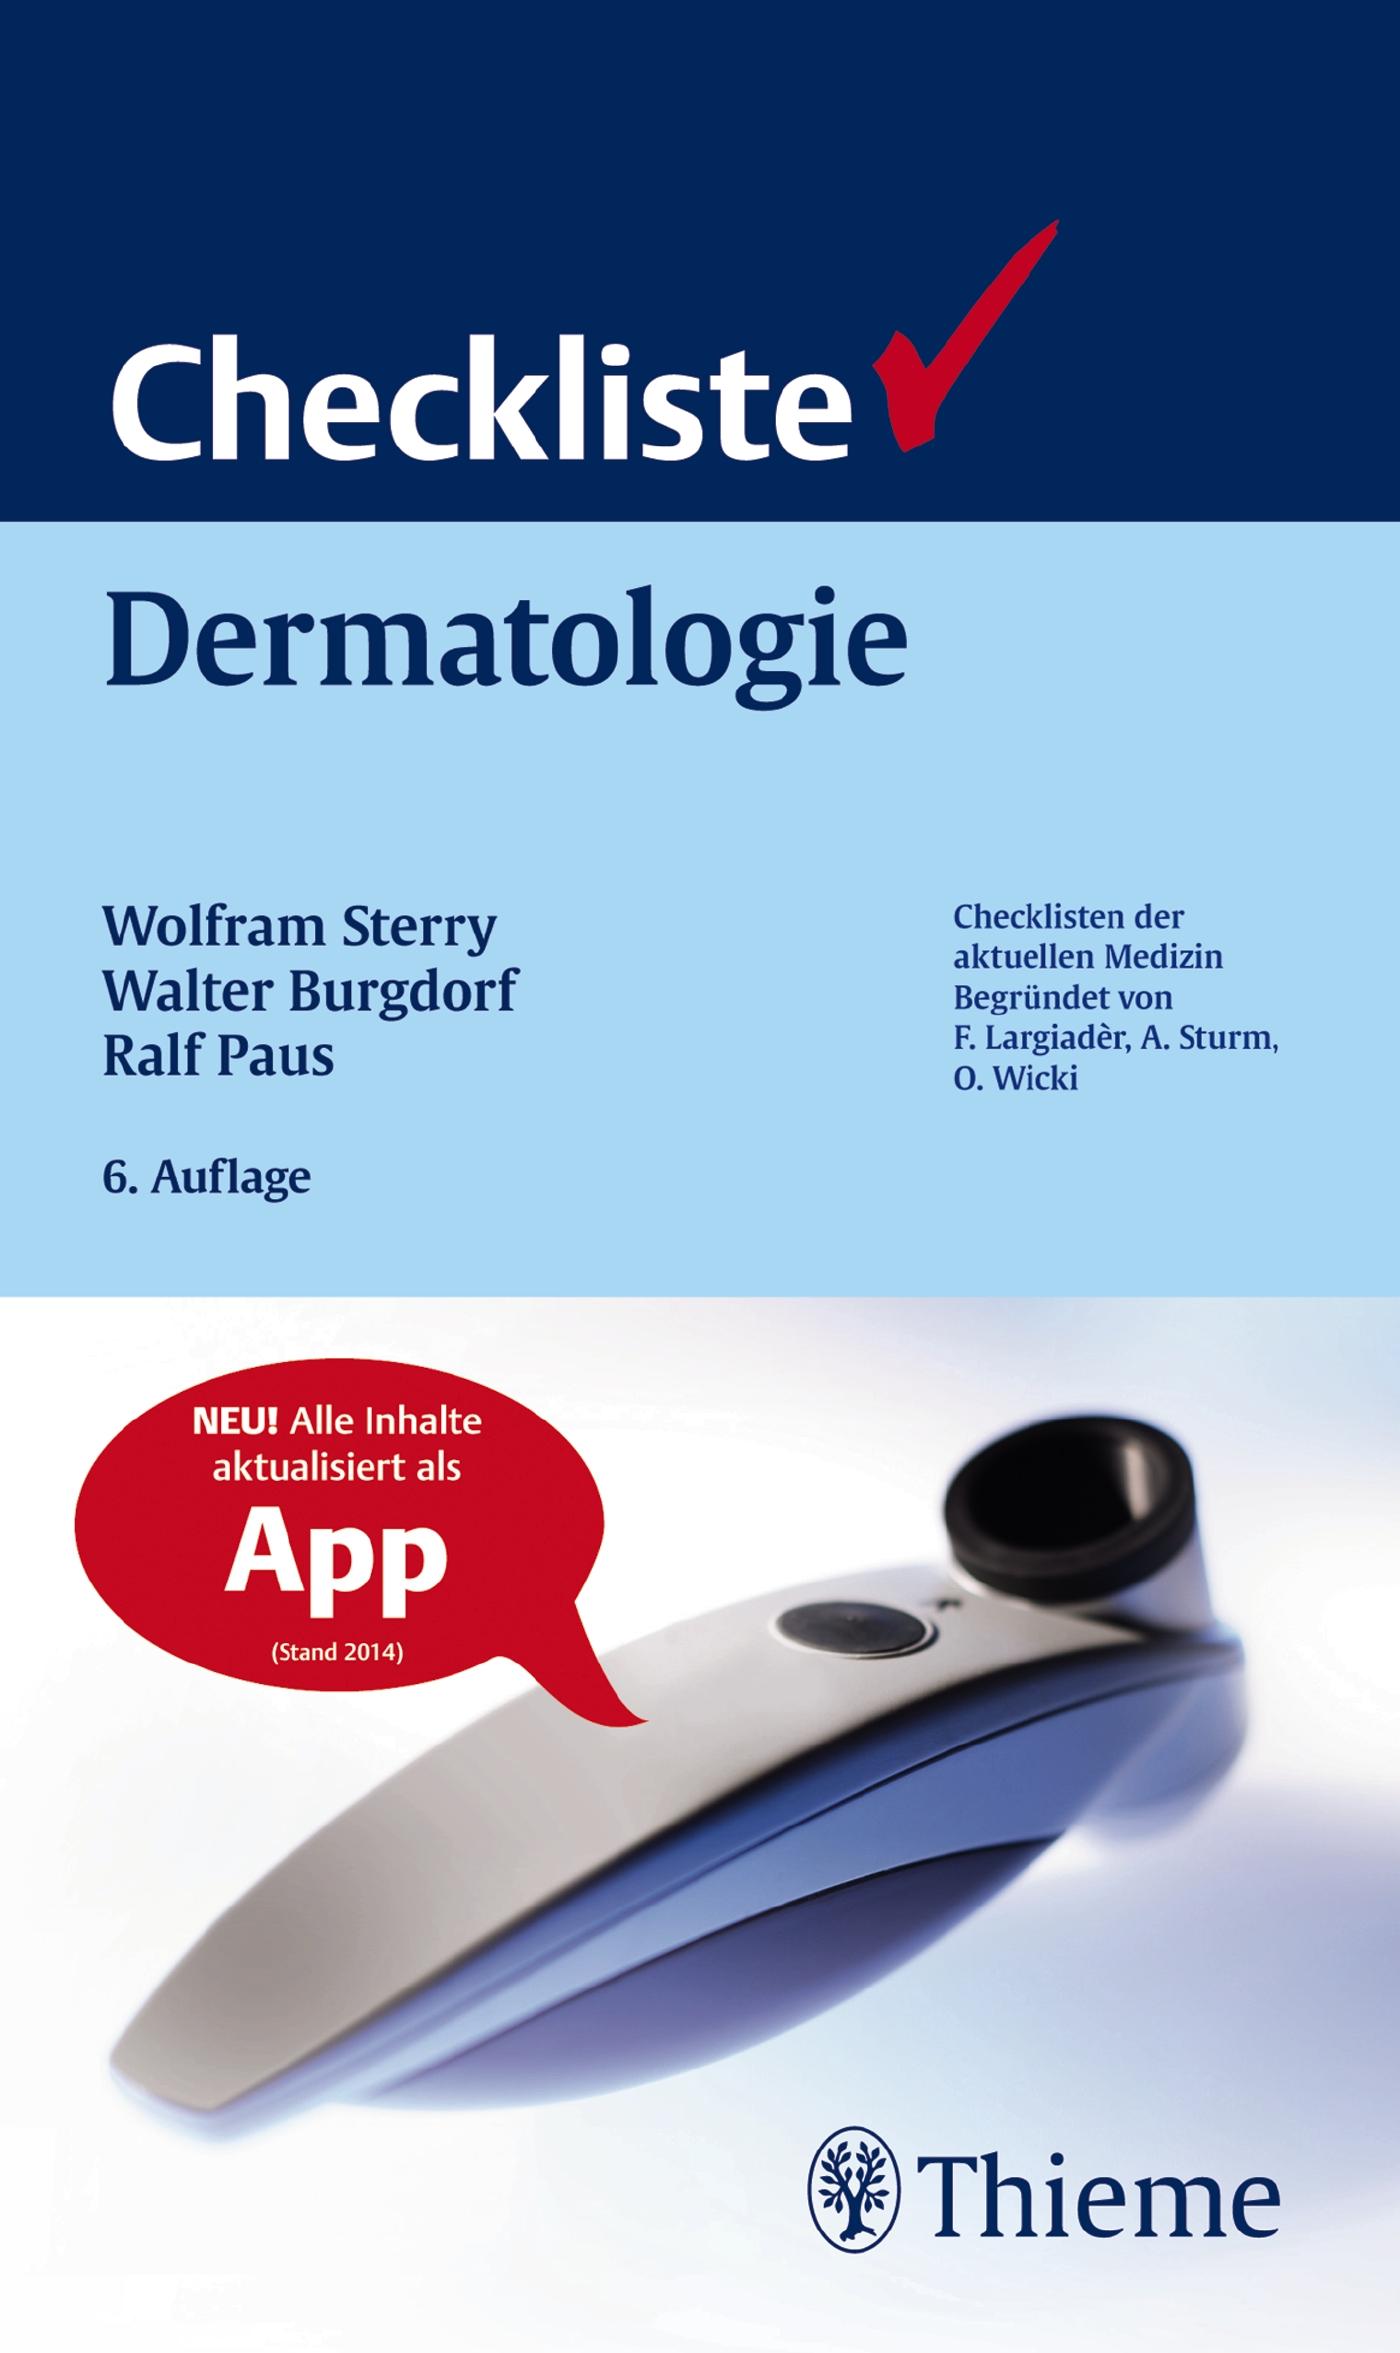 Checkliste Dermatologie: Venerologie, Allergologie, Phlebologie, Andrologie - Wolfram Sterry